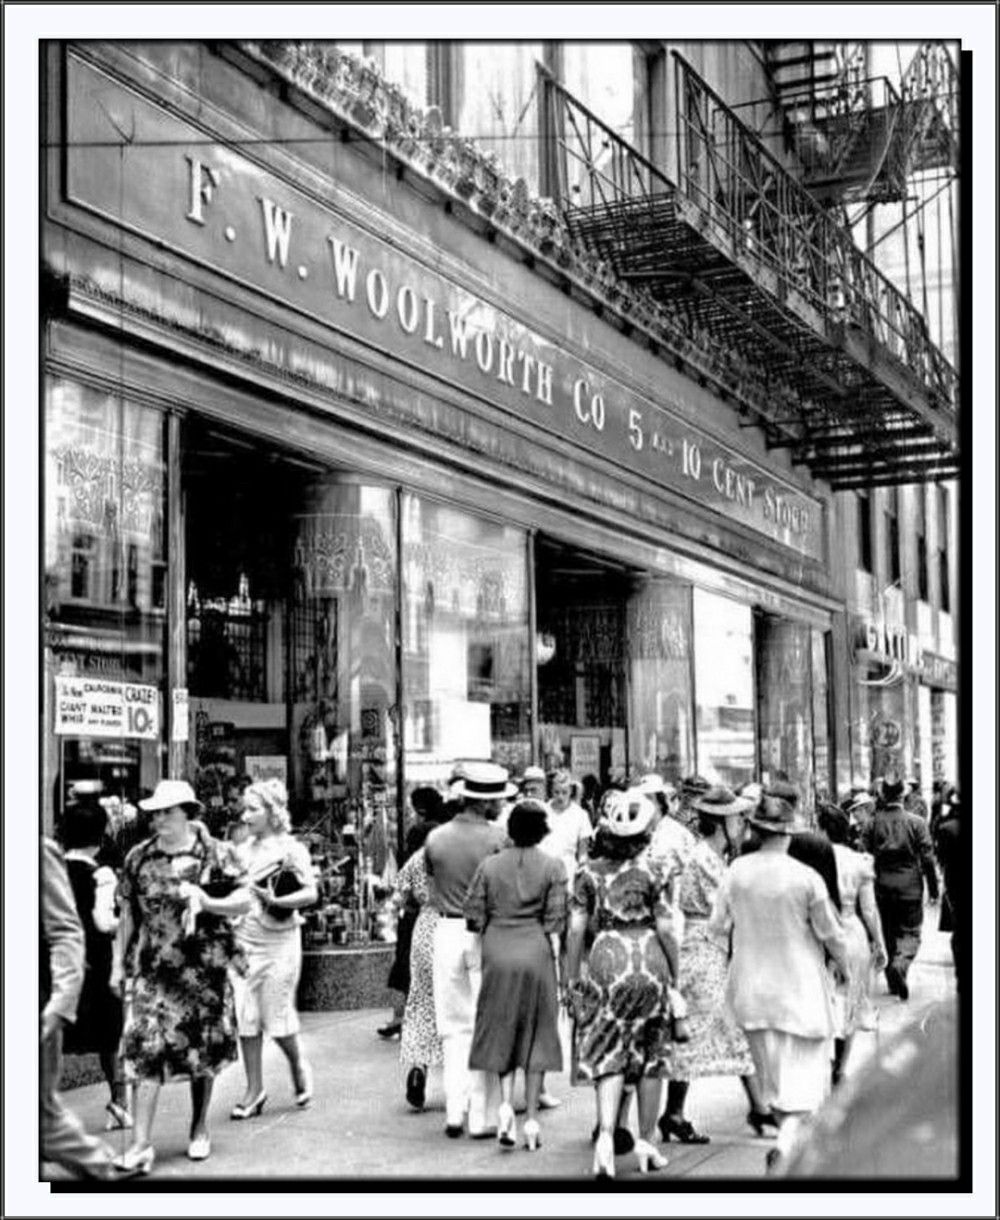 Urban shopping centers became popular as merchants